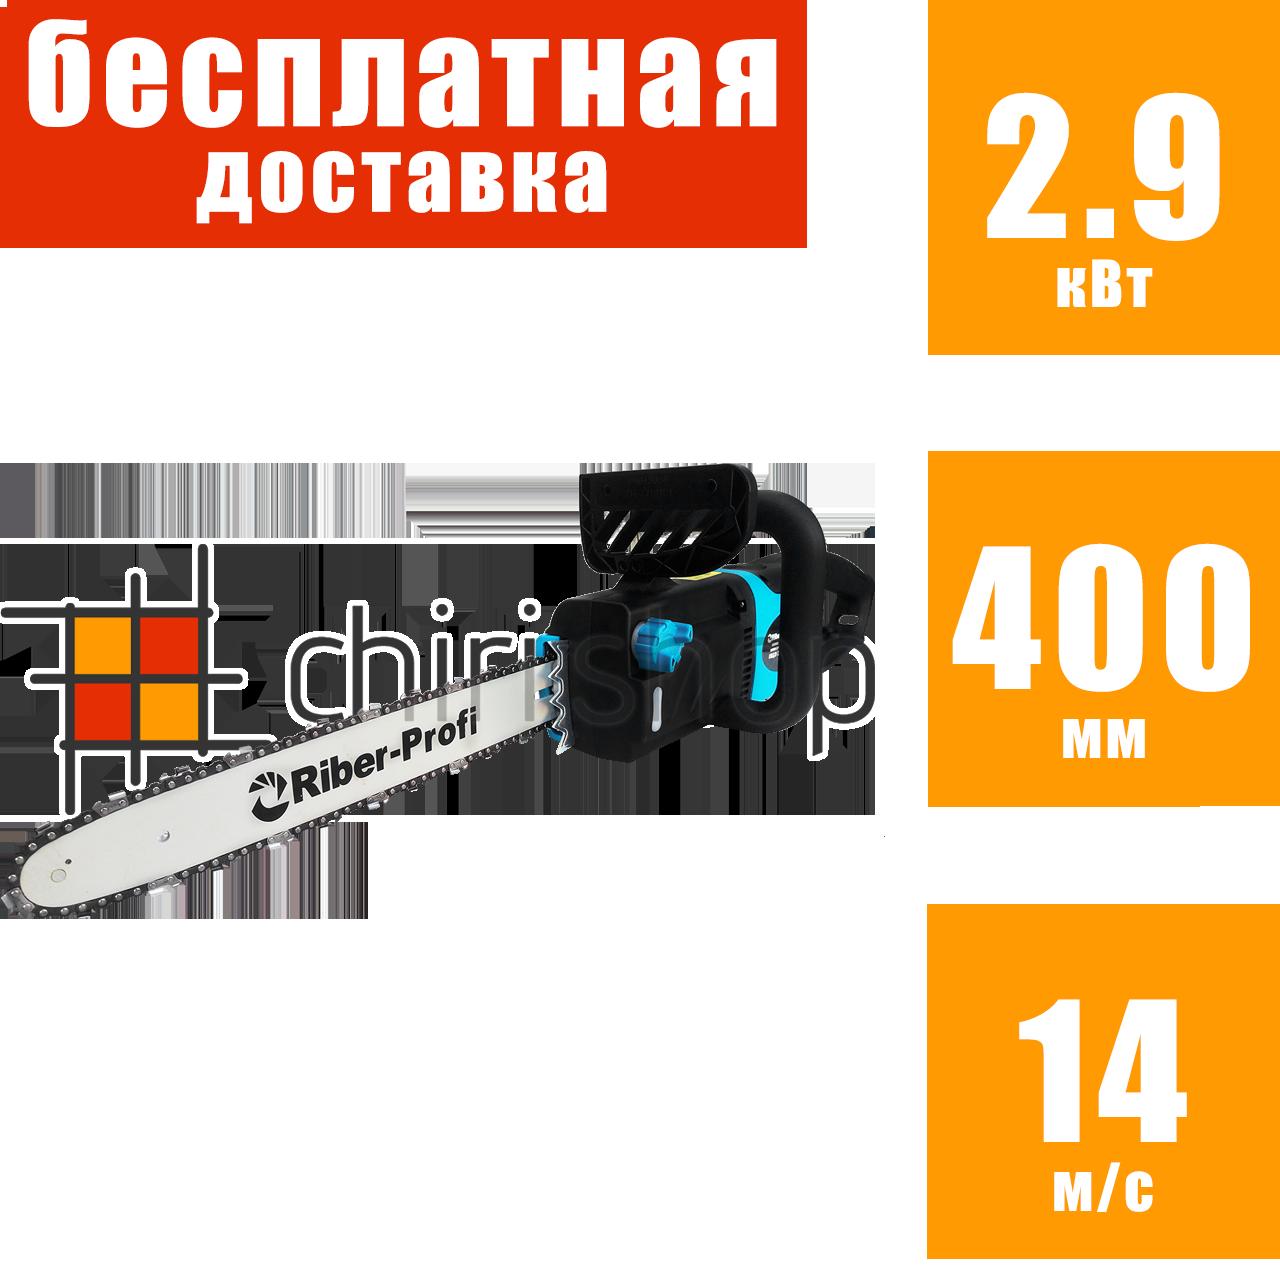 Электропила цепная прямая Riber ПЦЭ 2900М, 2.9 кВт, 400 мм, электрическая пила цепная